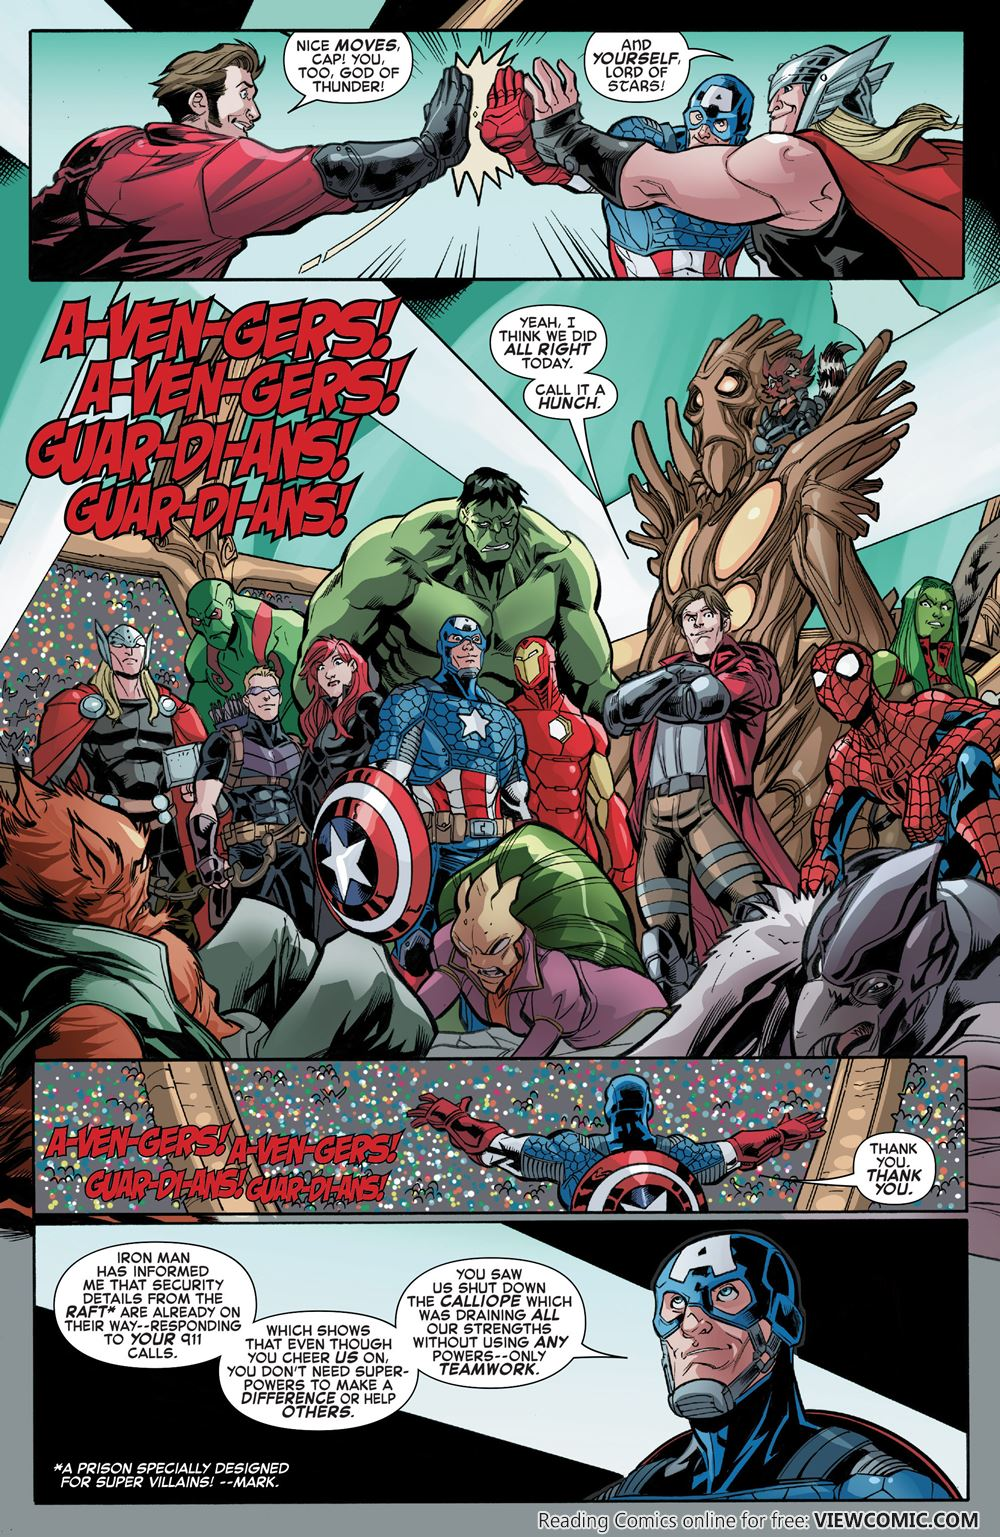 Online Free Marvel Comics